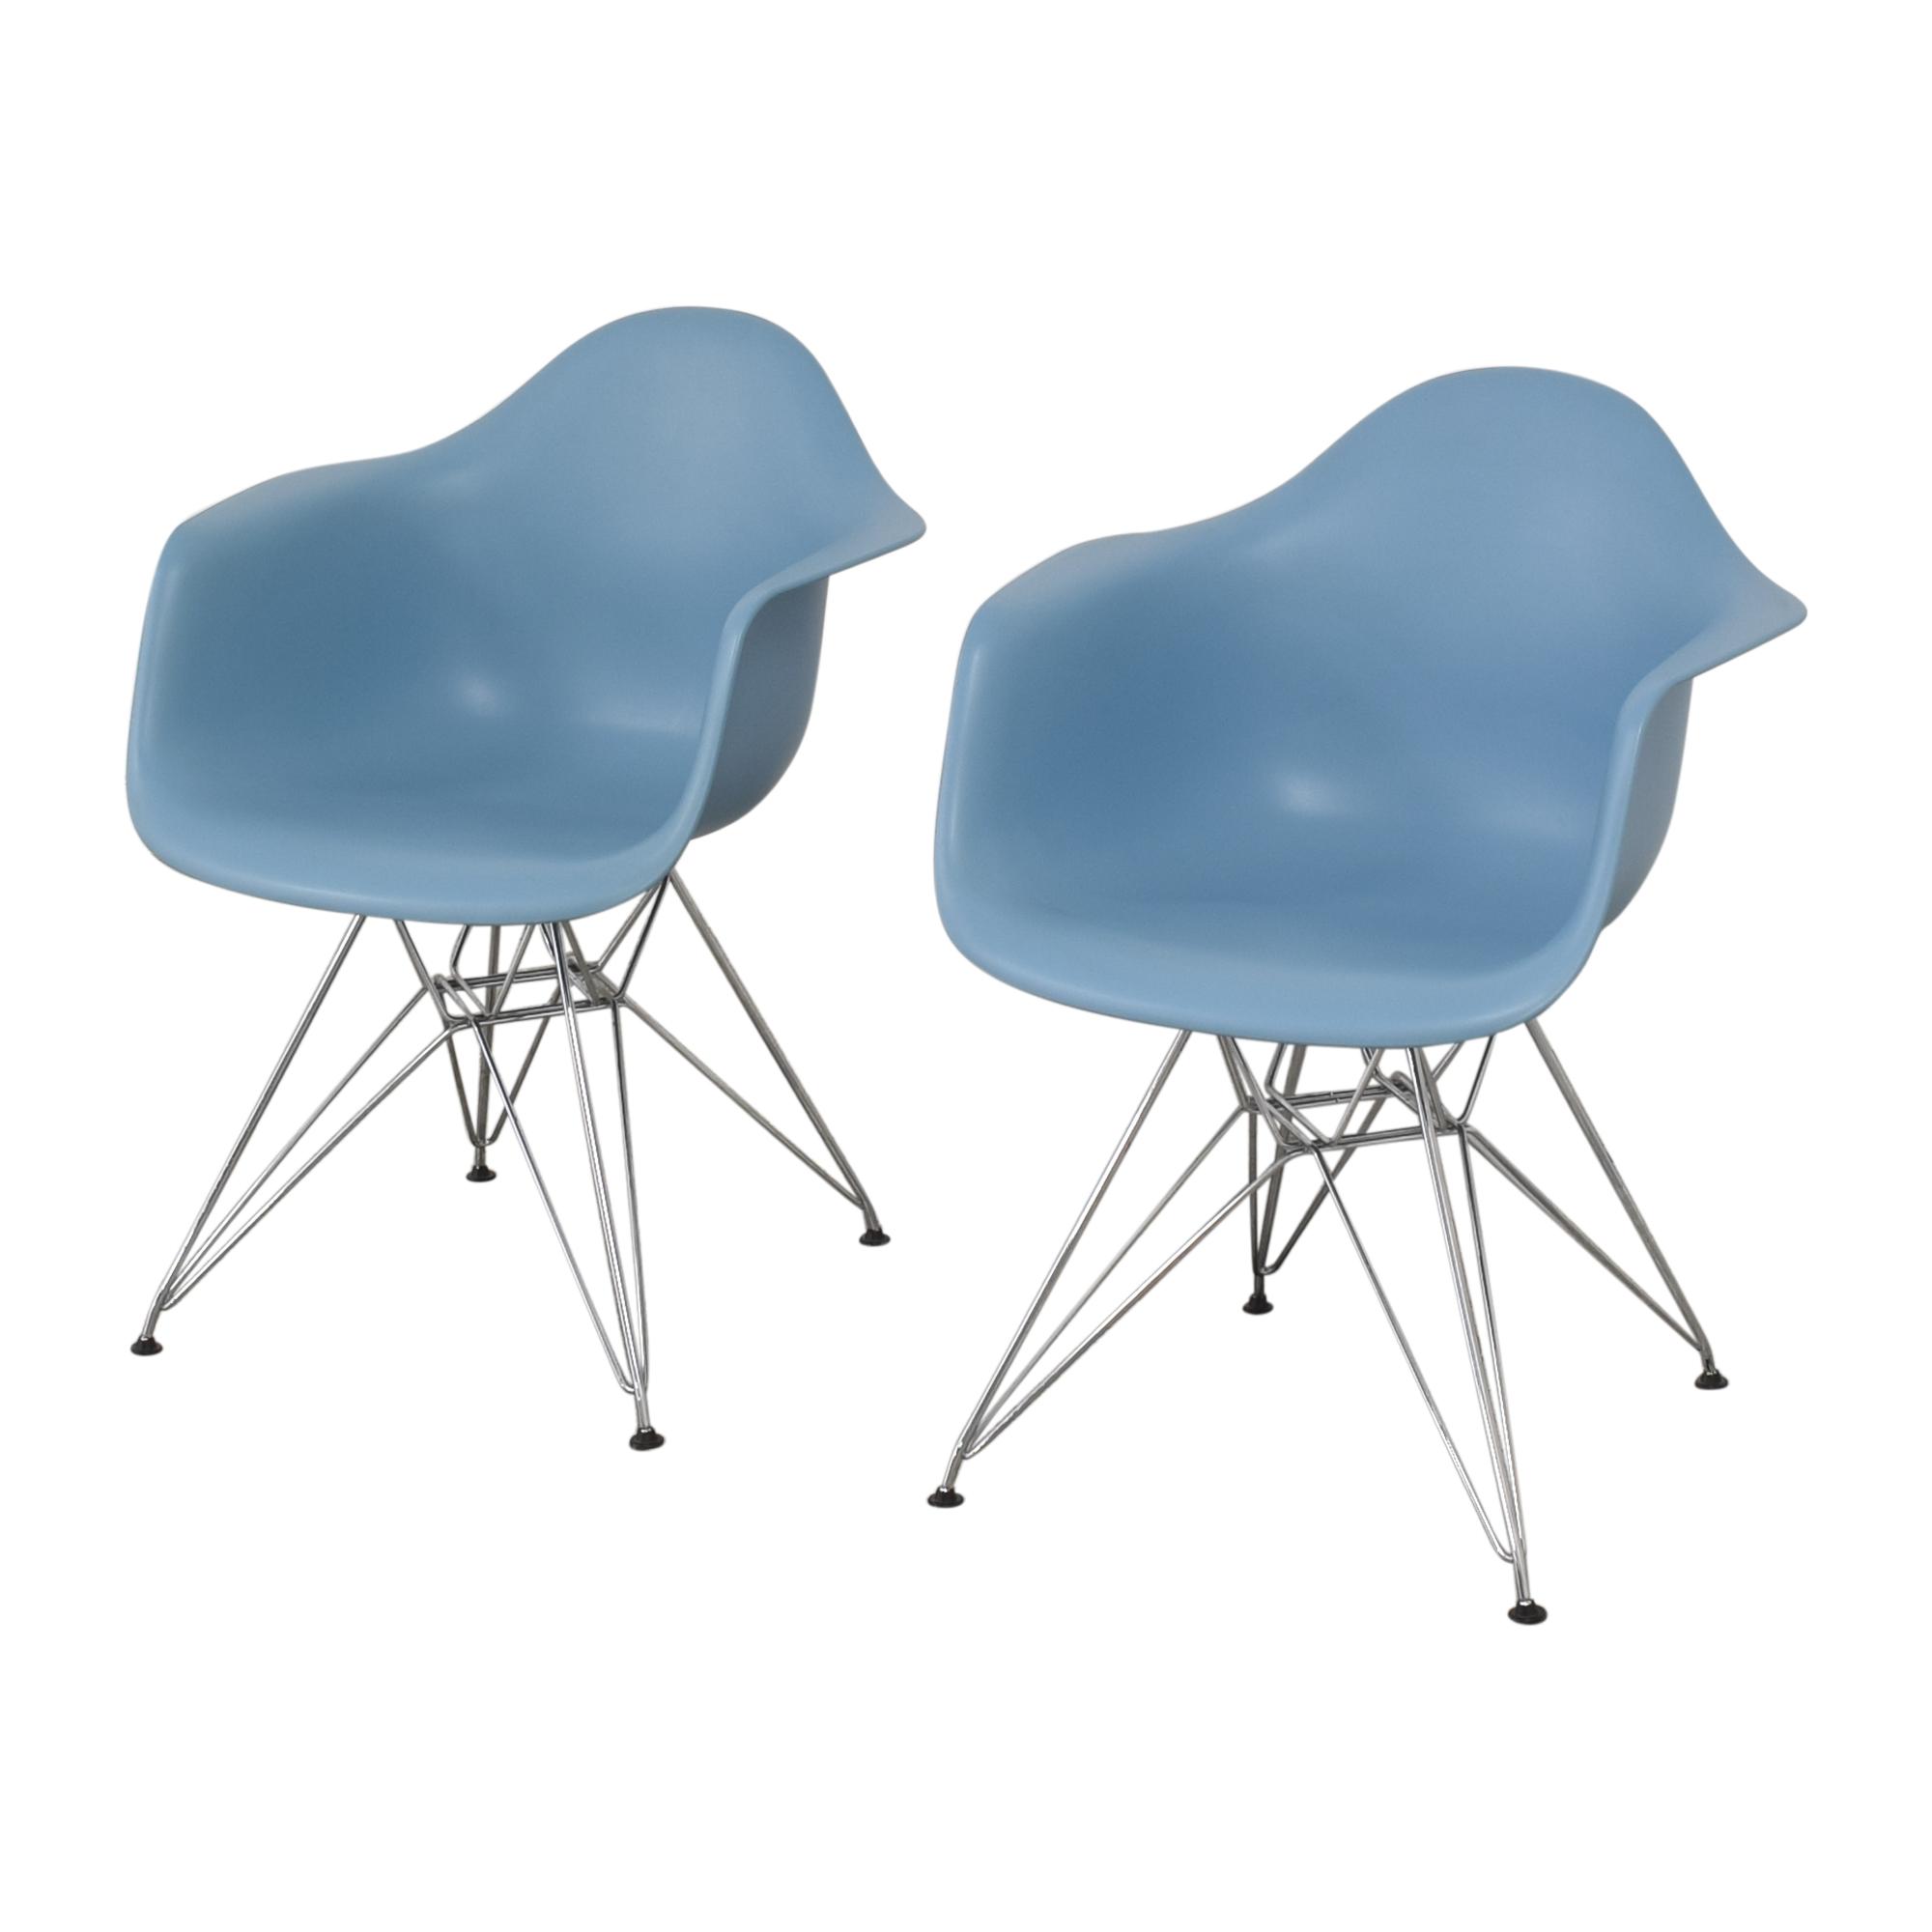 Herman Miller Herman Miller Eames Molded Armchairs for sale